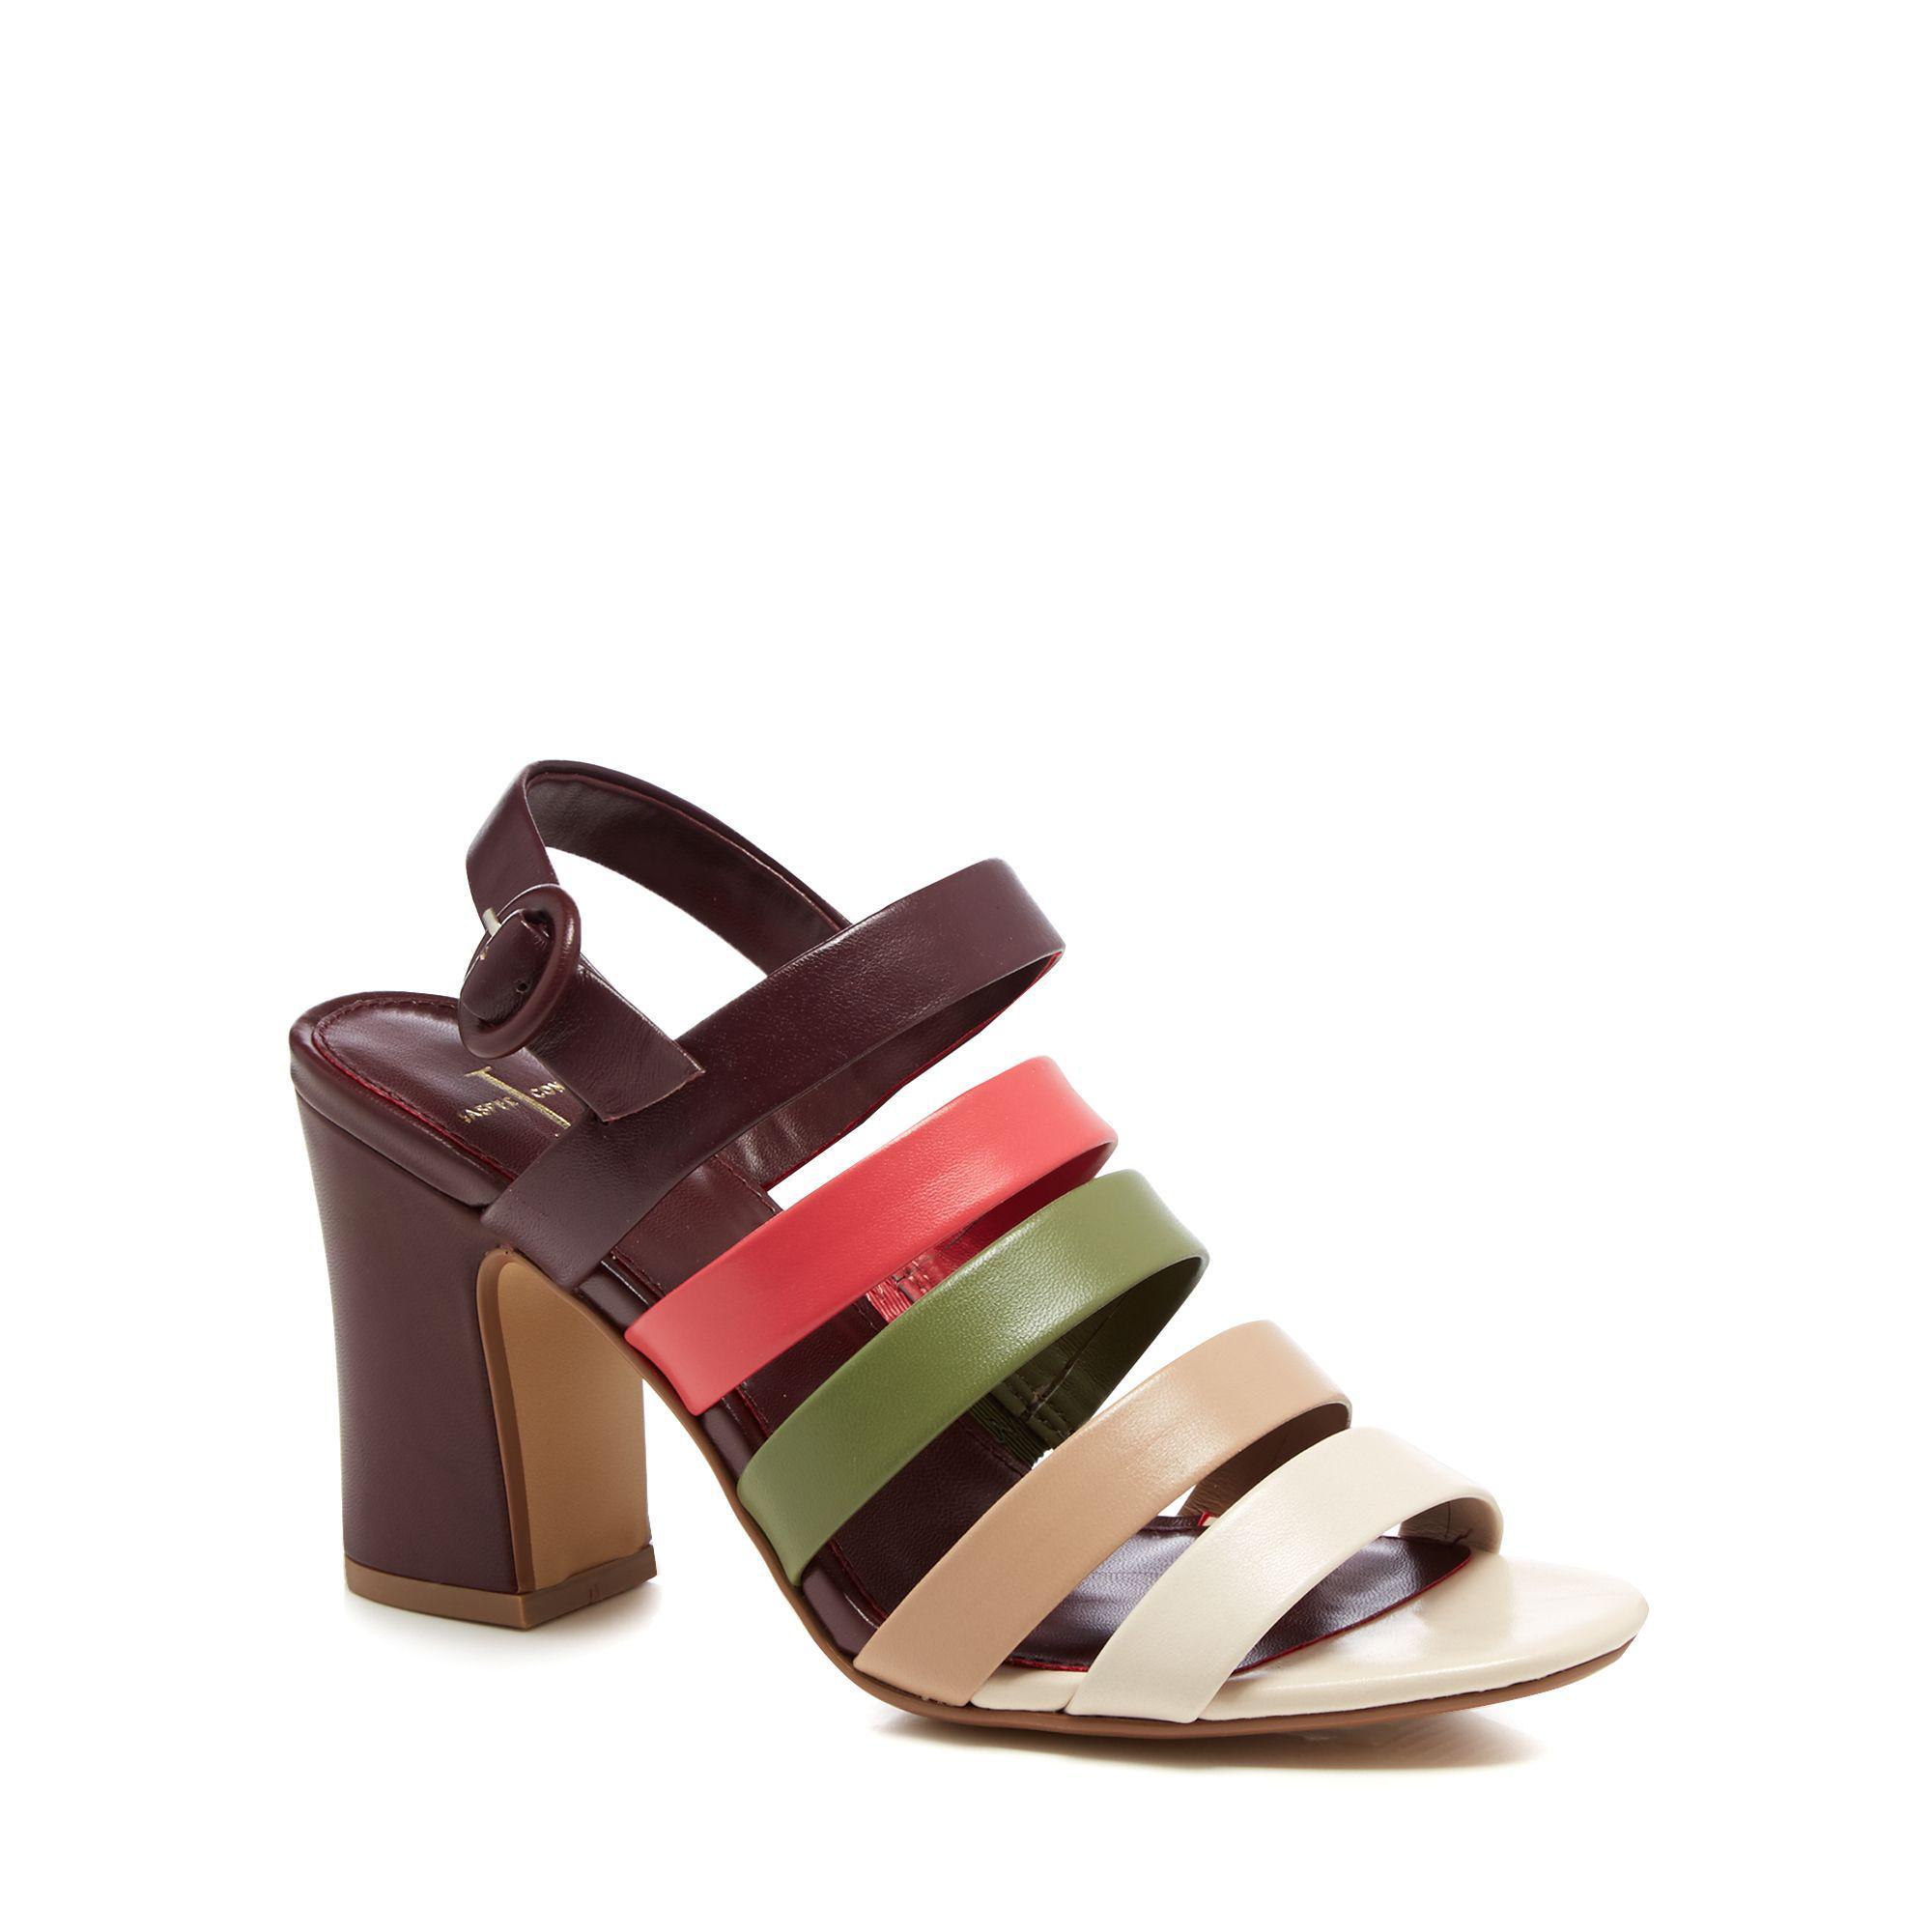 b5906e50b09f47 J By Jasper Conran Multi-coloured Leather  joelle  High Block Heel ...